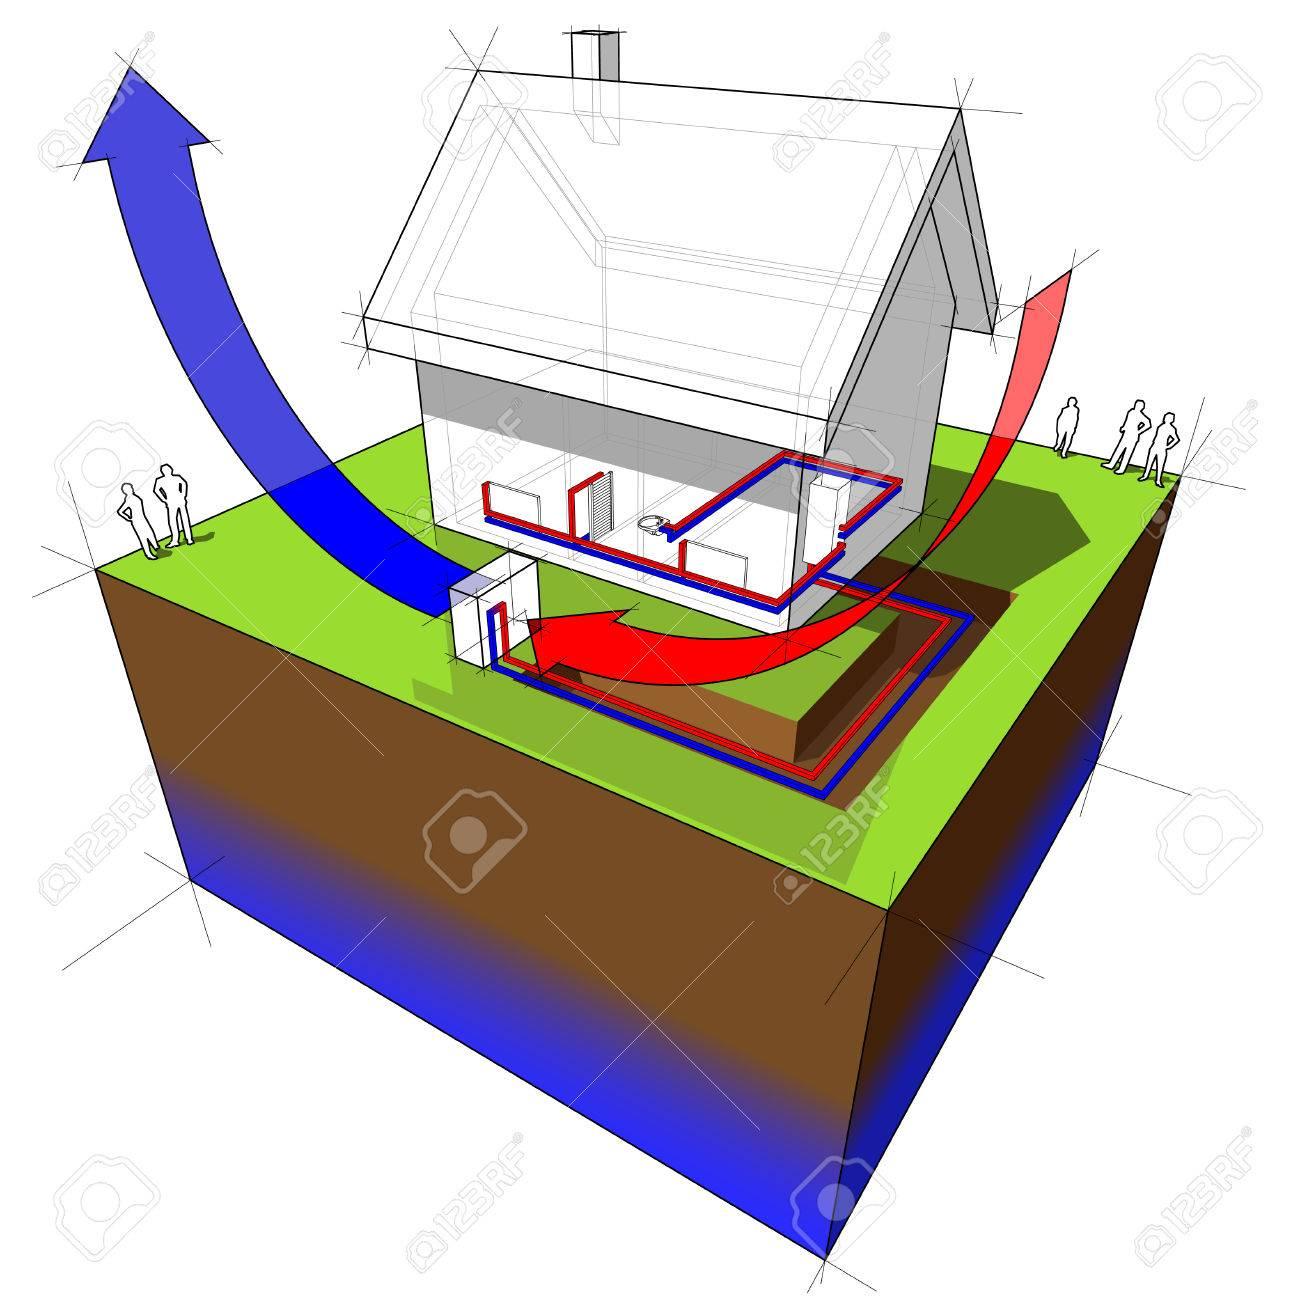 air source heat pump diagram Stock Vector - 8986642